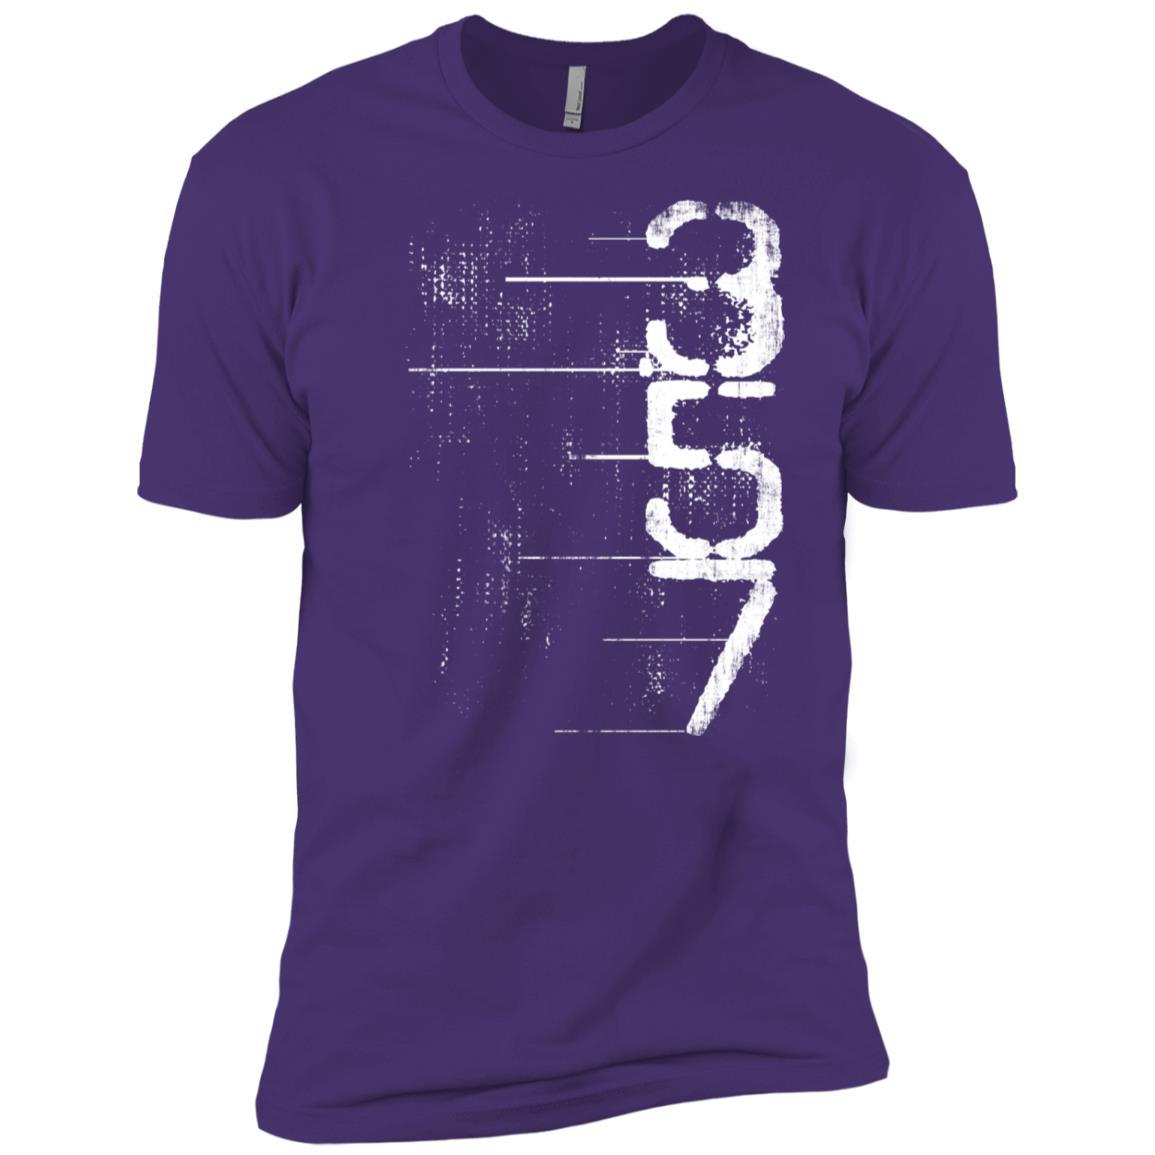 357 Ammo Shooting Firing Range Gun Lovers s Men Short Sleeve T-Shirt